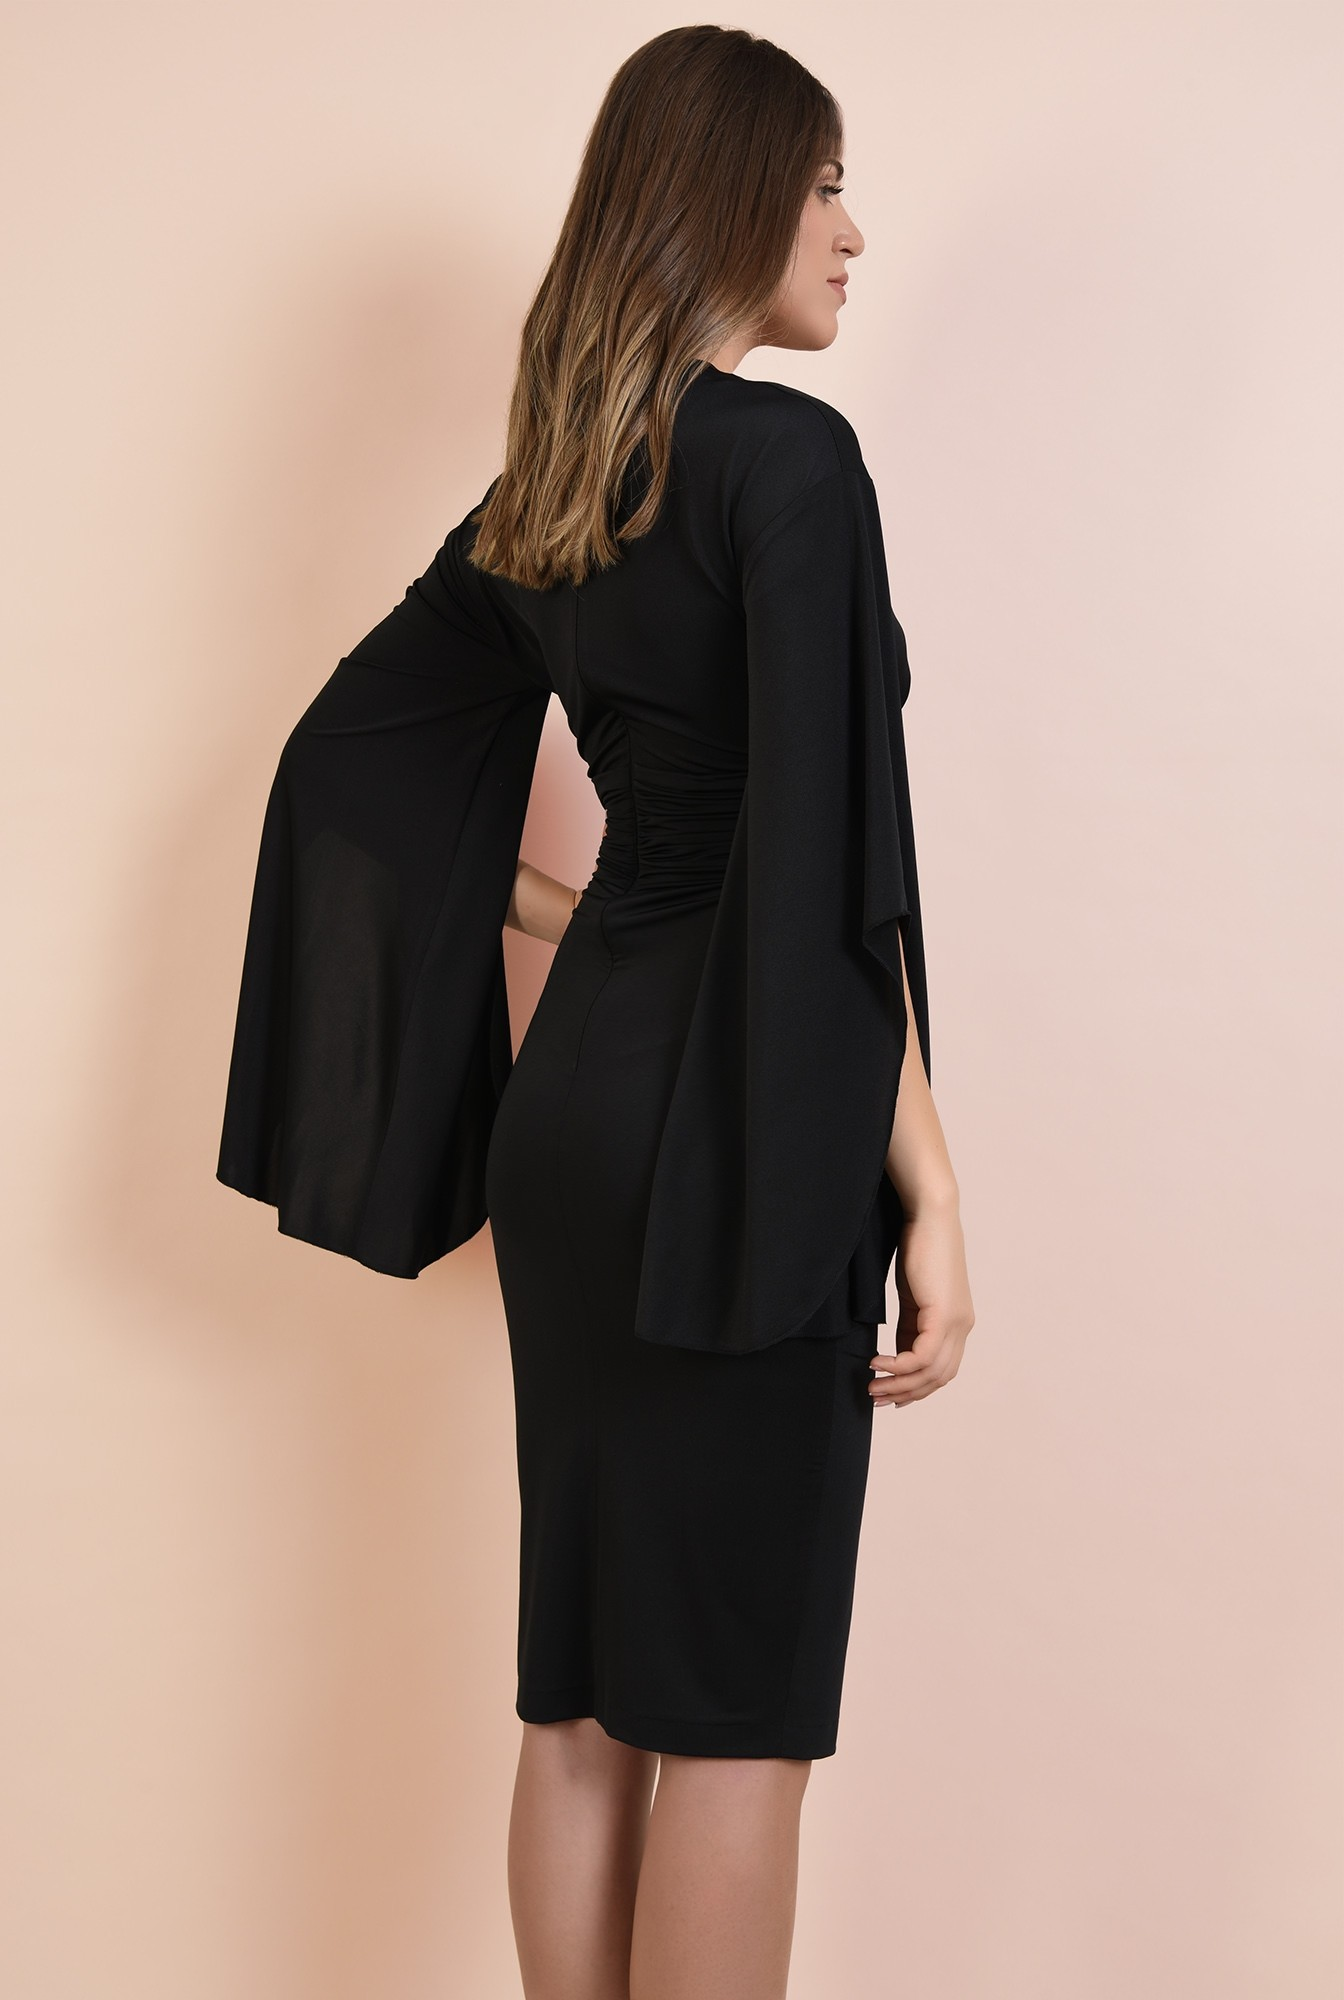 1 - rochie eleganta, midi, conica, maneci fantezie, talie fronsata, Poema